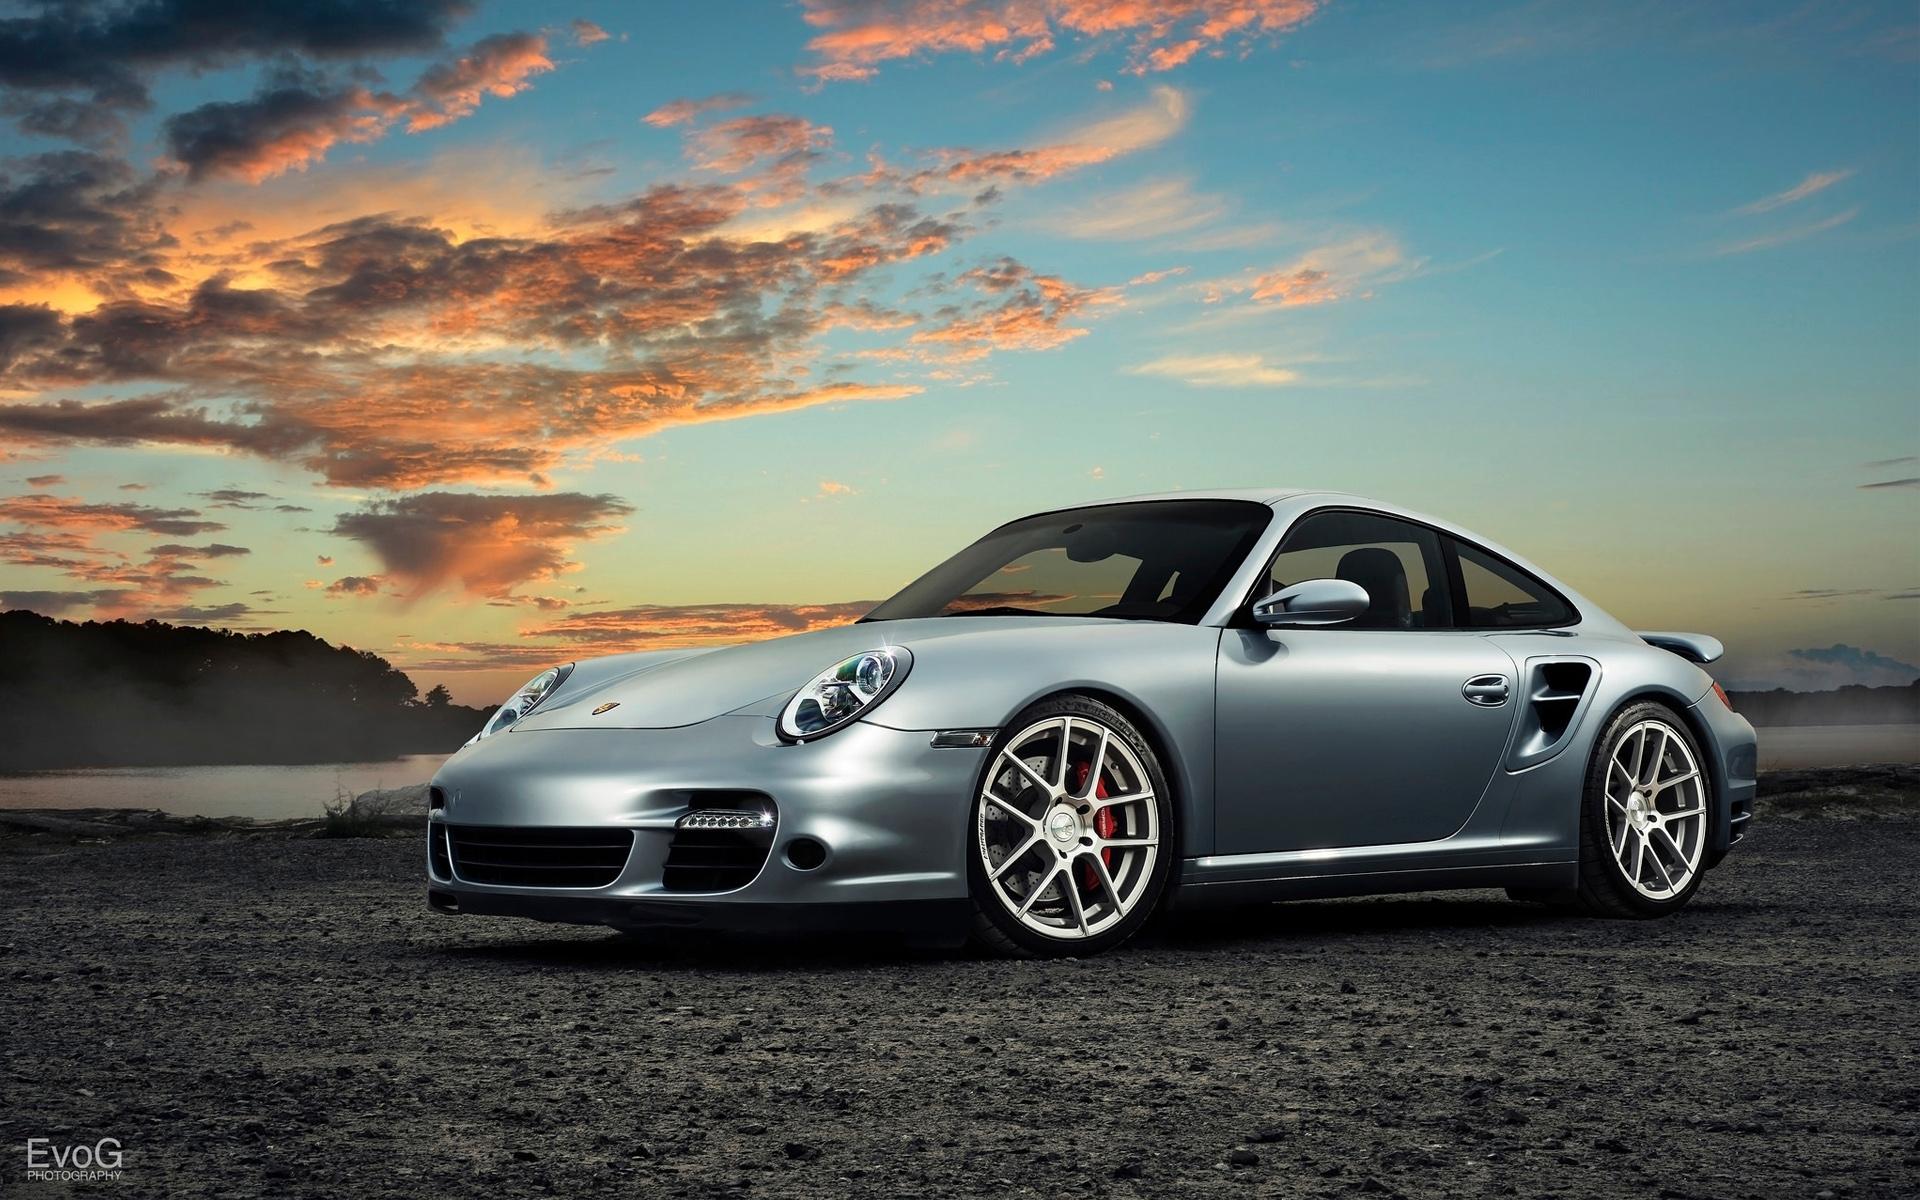 porsche 911 turbo avant garde - 2015 Porsche 911 Turbo Wallpaper